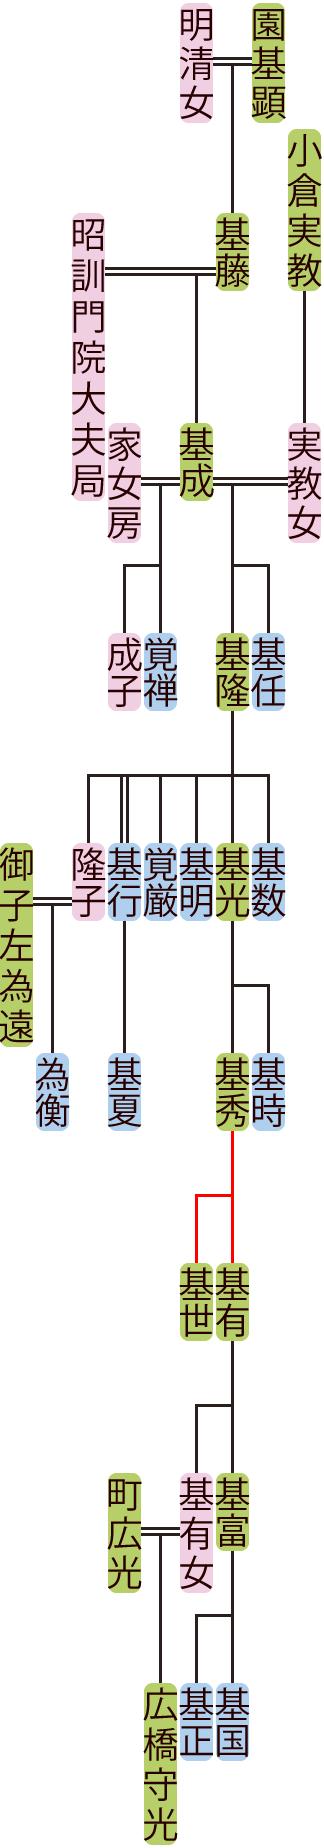 園基成~基有の系図